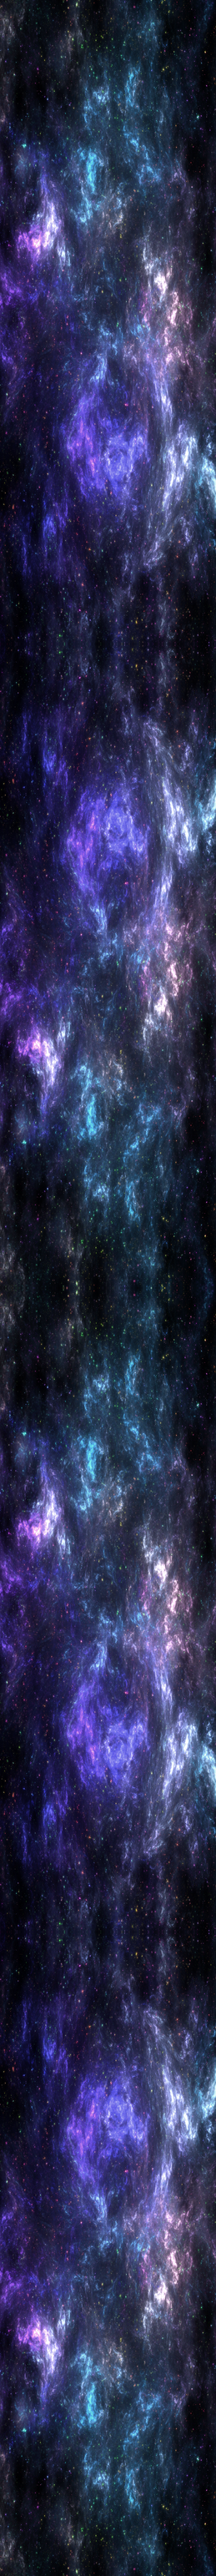 Cold Nebula RAINBOW STARS [Custom Box Background] by darkdissolution